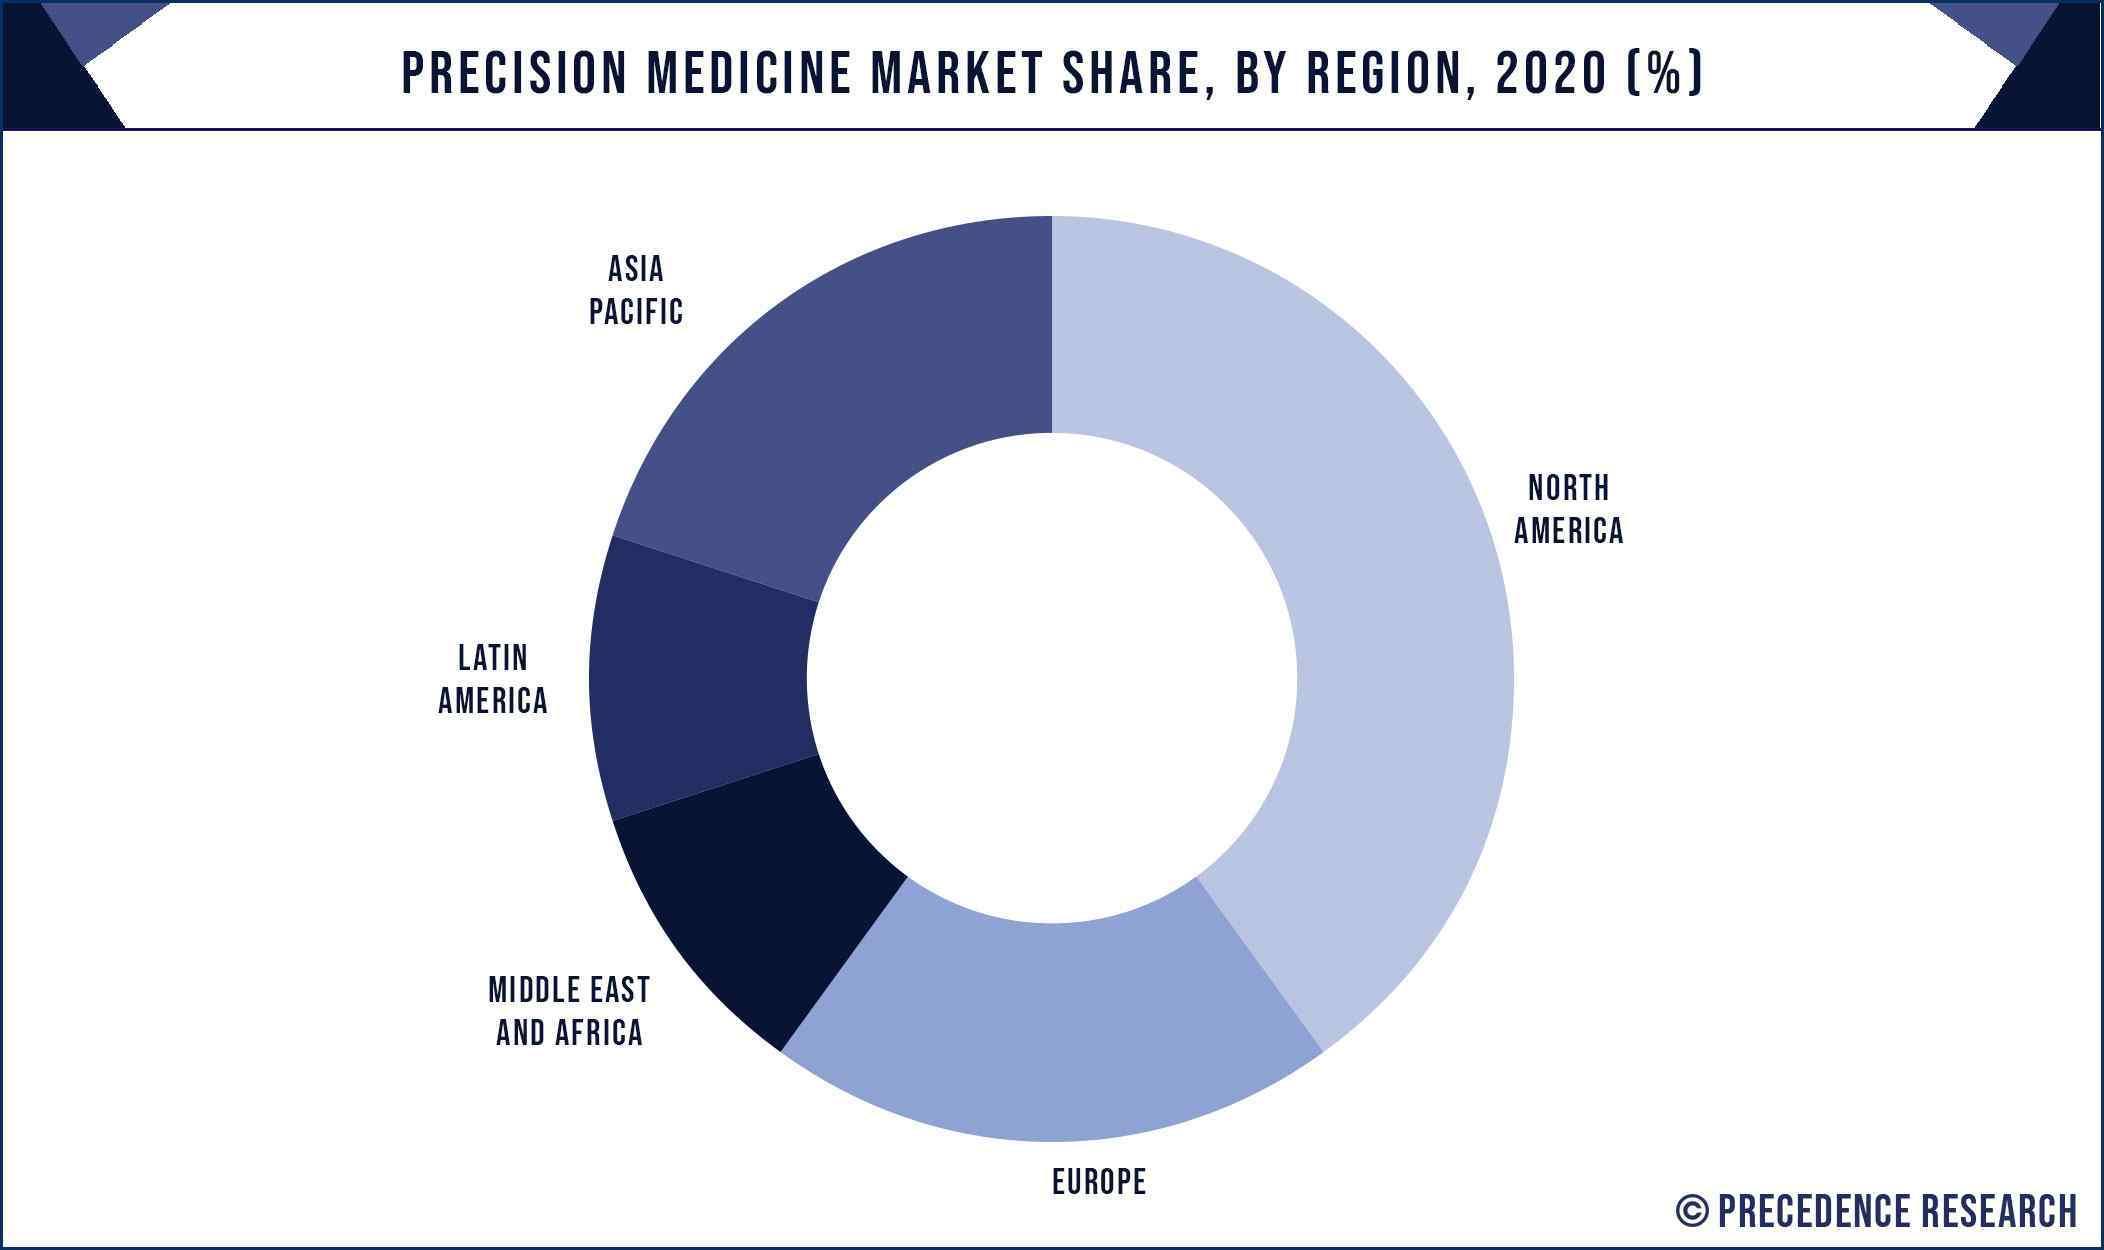 Precision Medicine Market Share, By Region, 2020 (%)